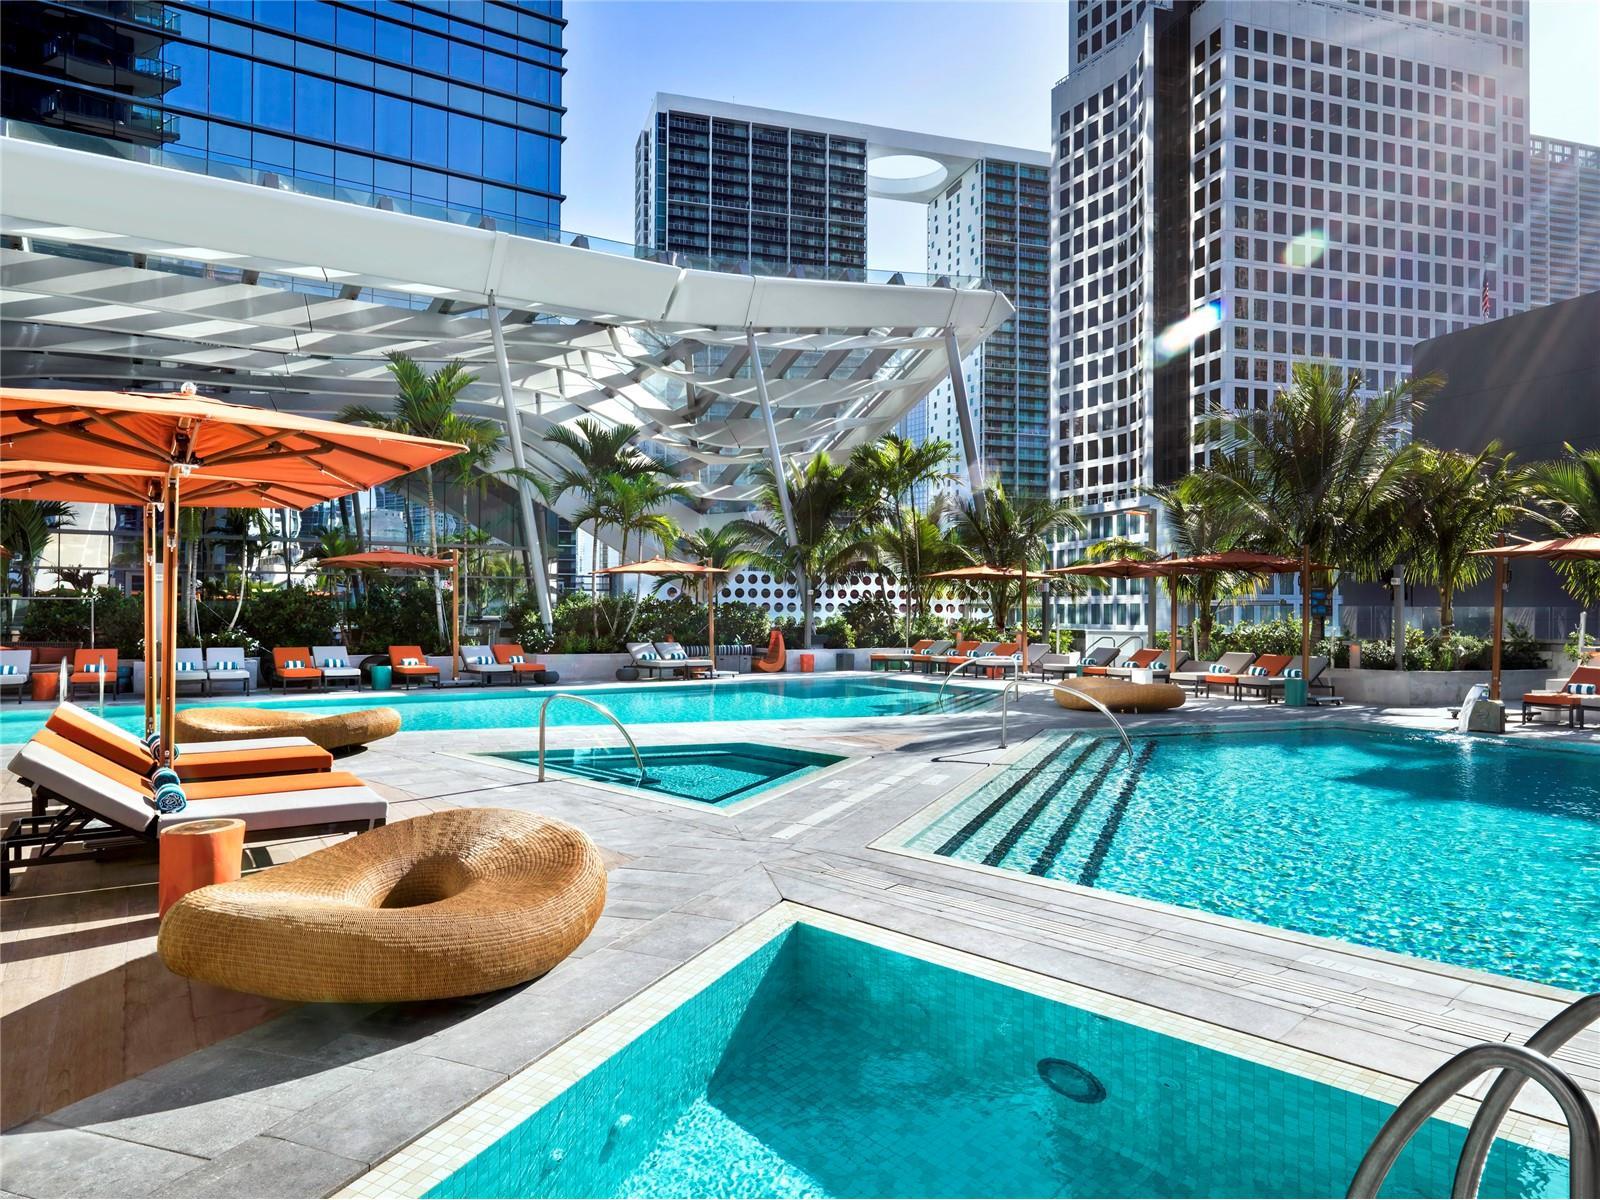 East Hotel Pool